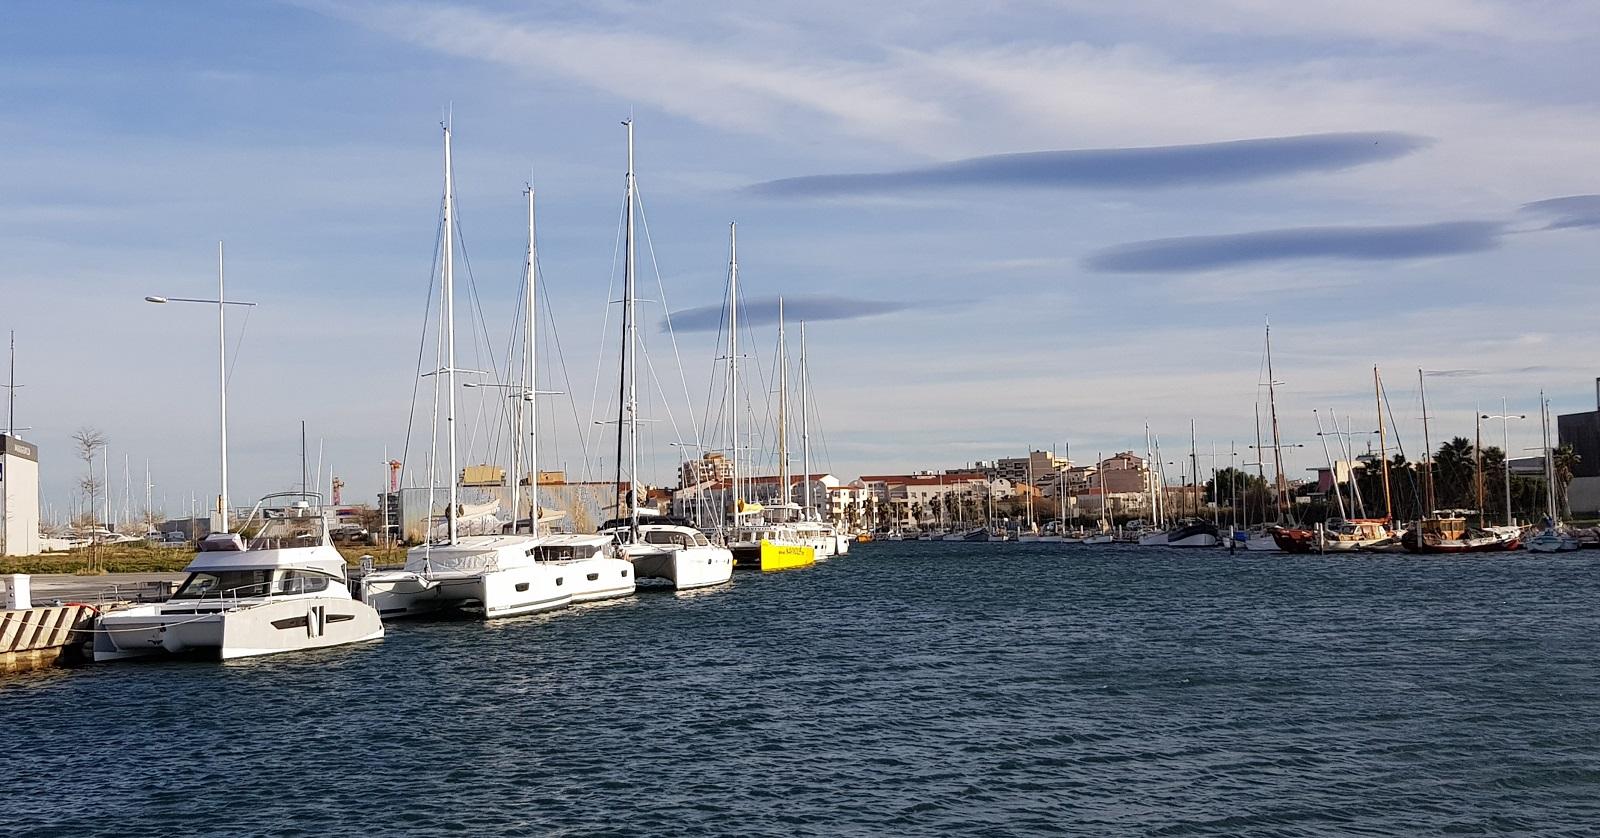 Canet en Roussillon - windy but sunny